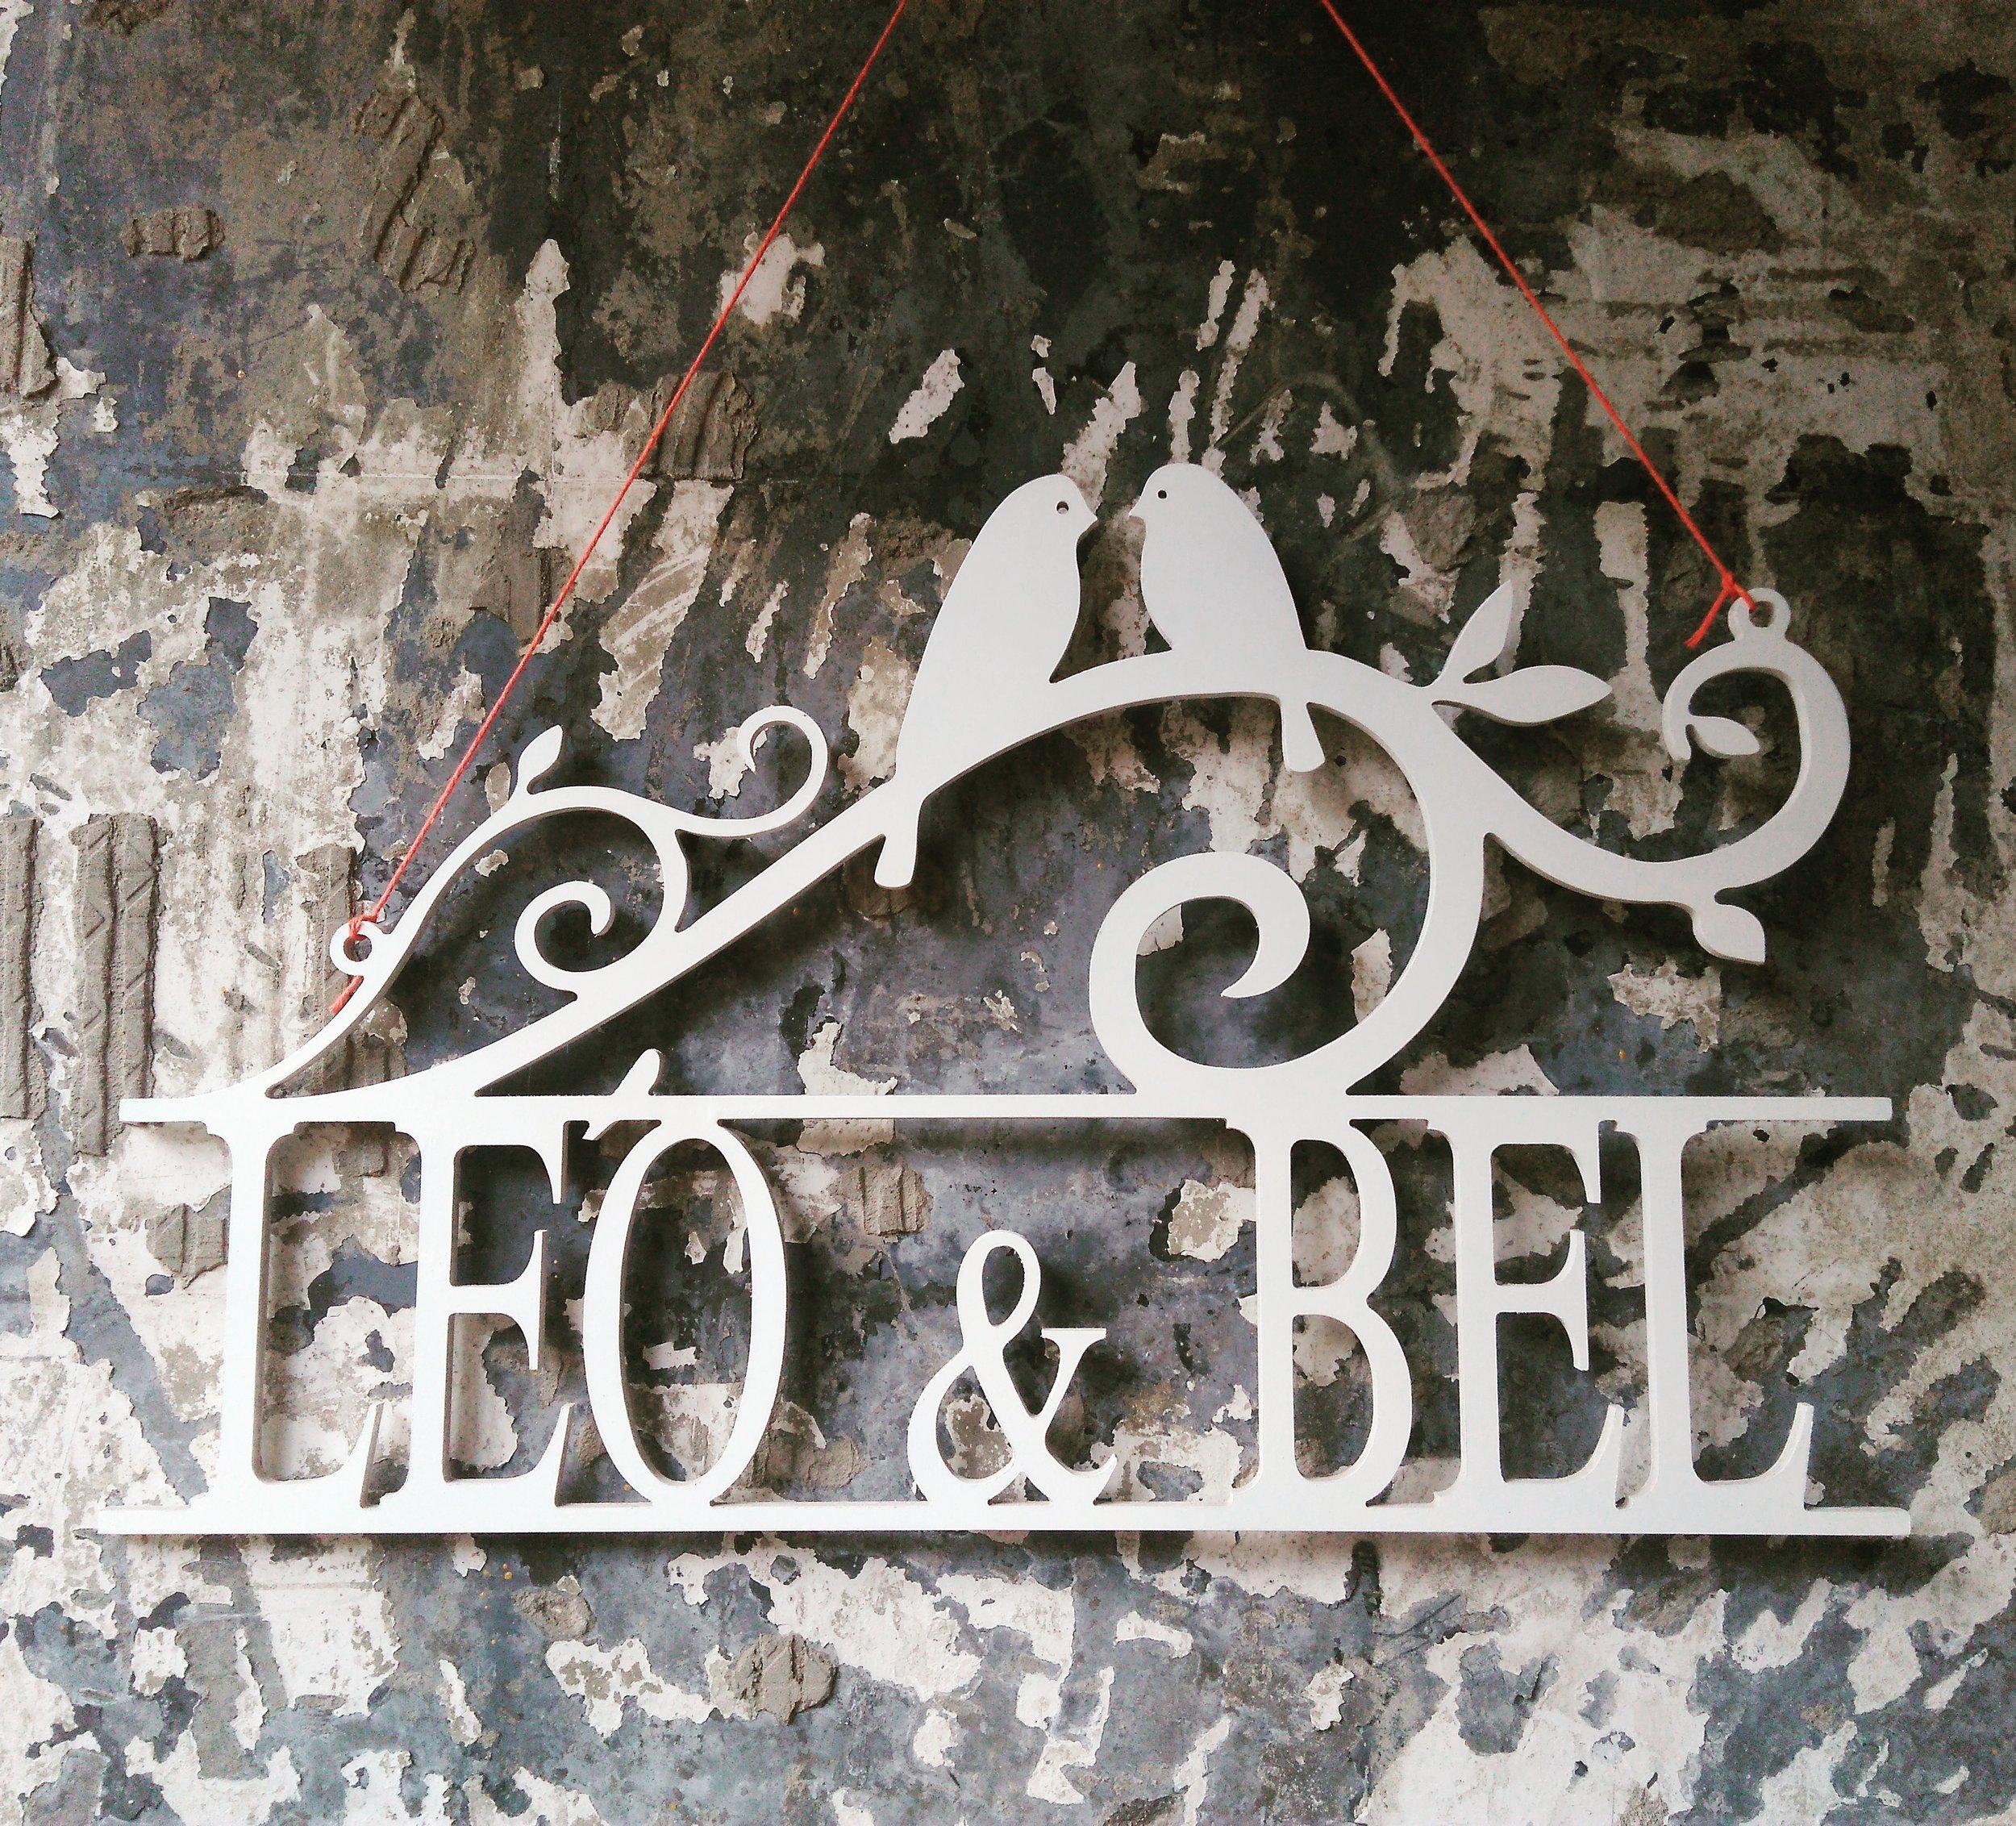 Leo e Bel